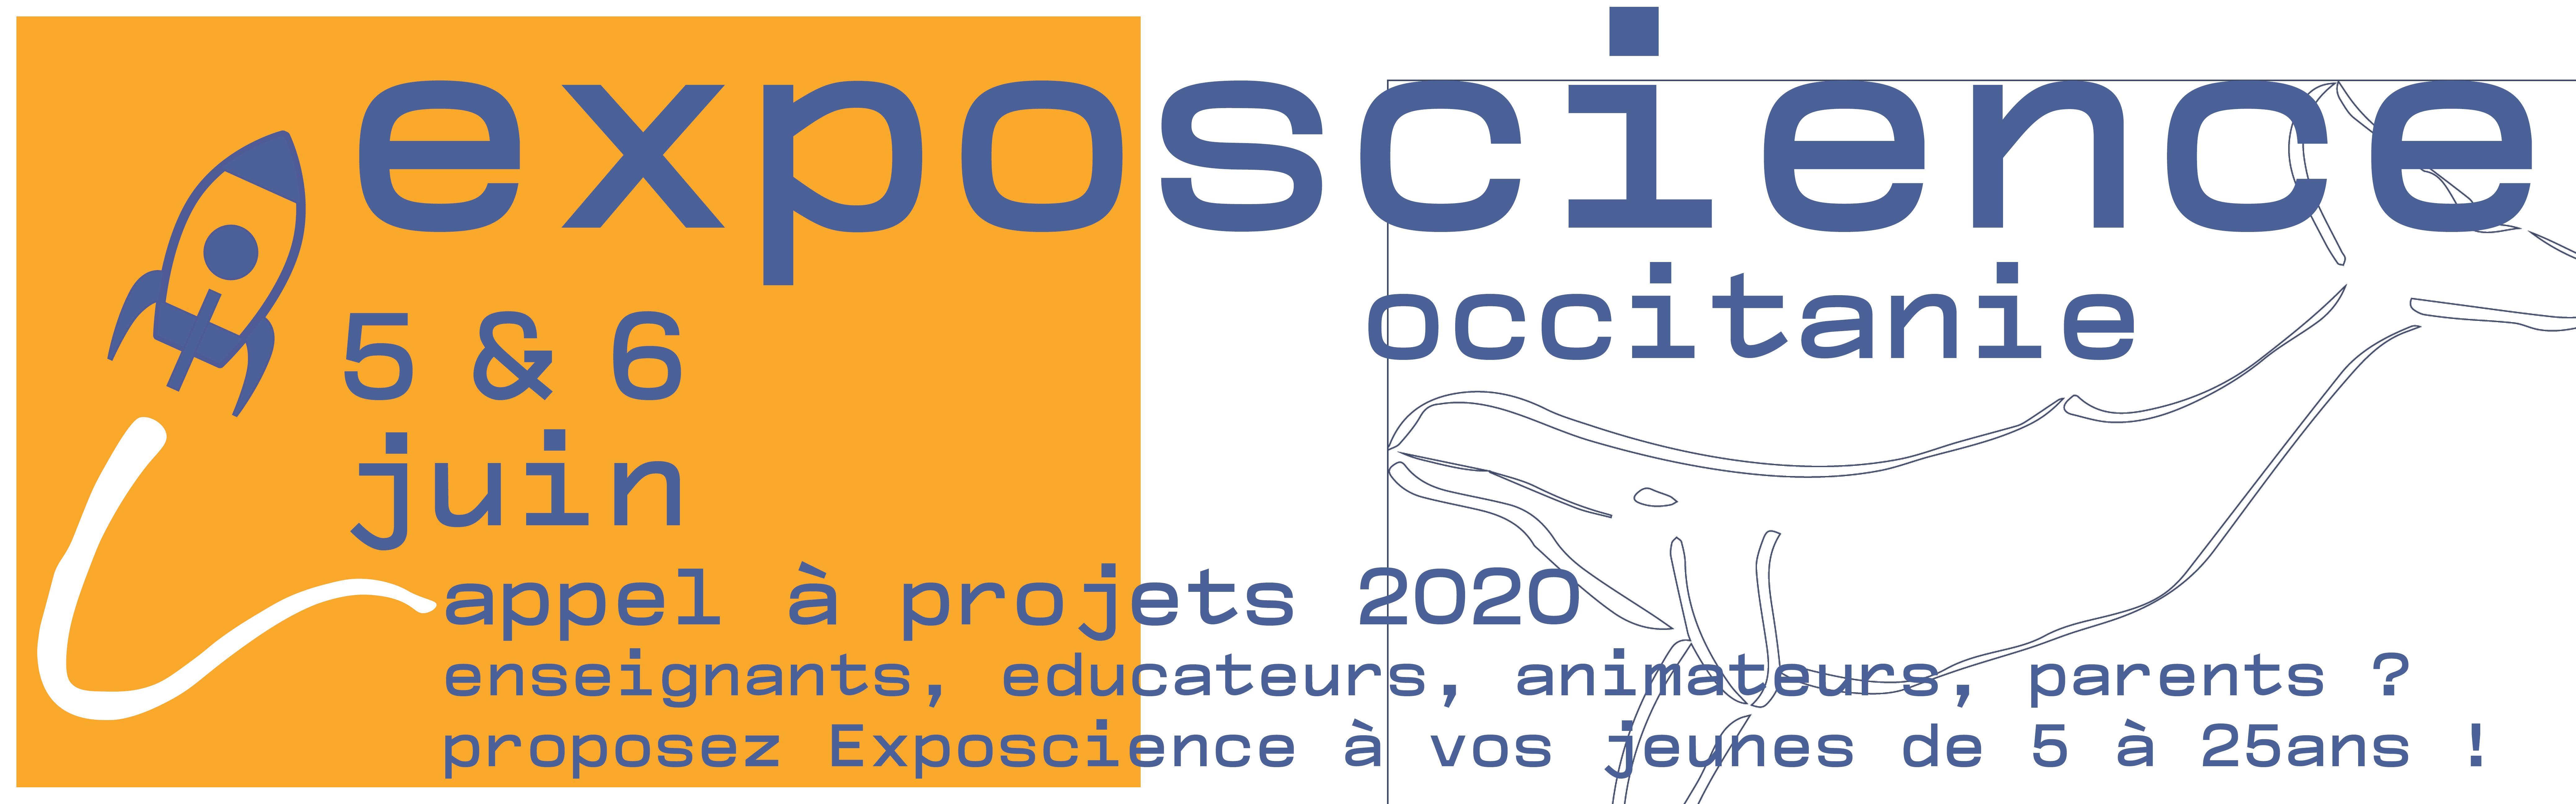 Exposcience Occitanie 2020